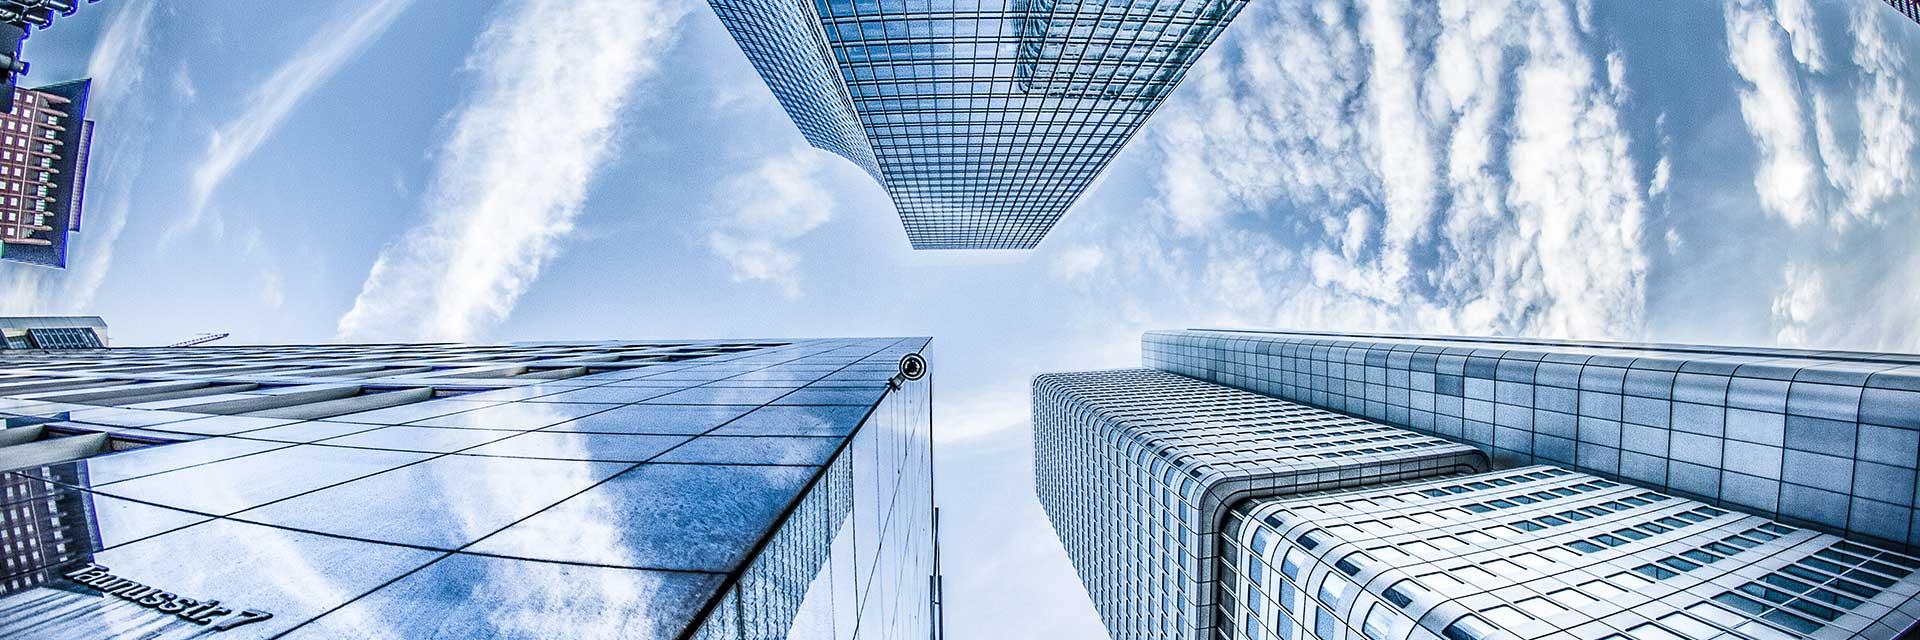 Unternehmensmarke-Dachmarke